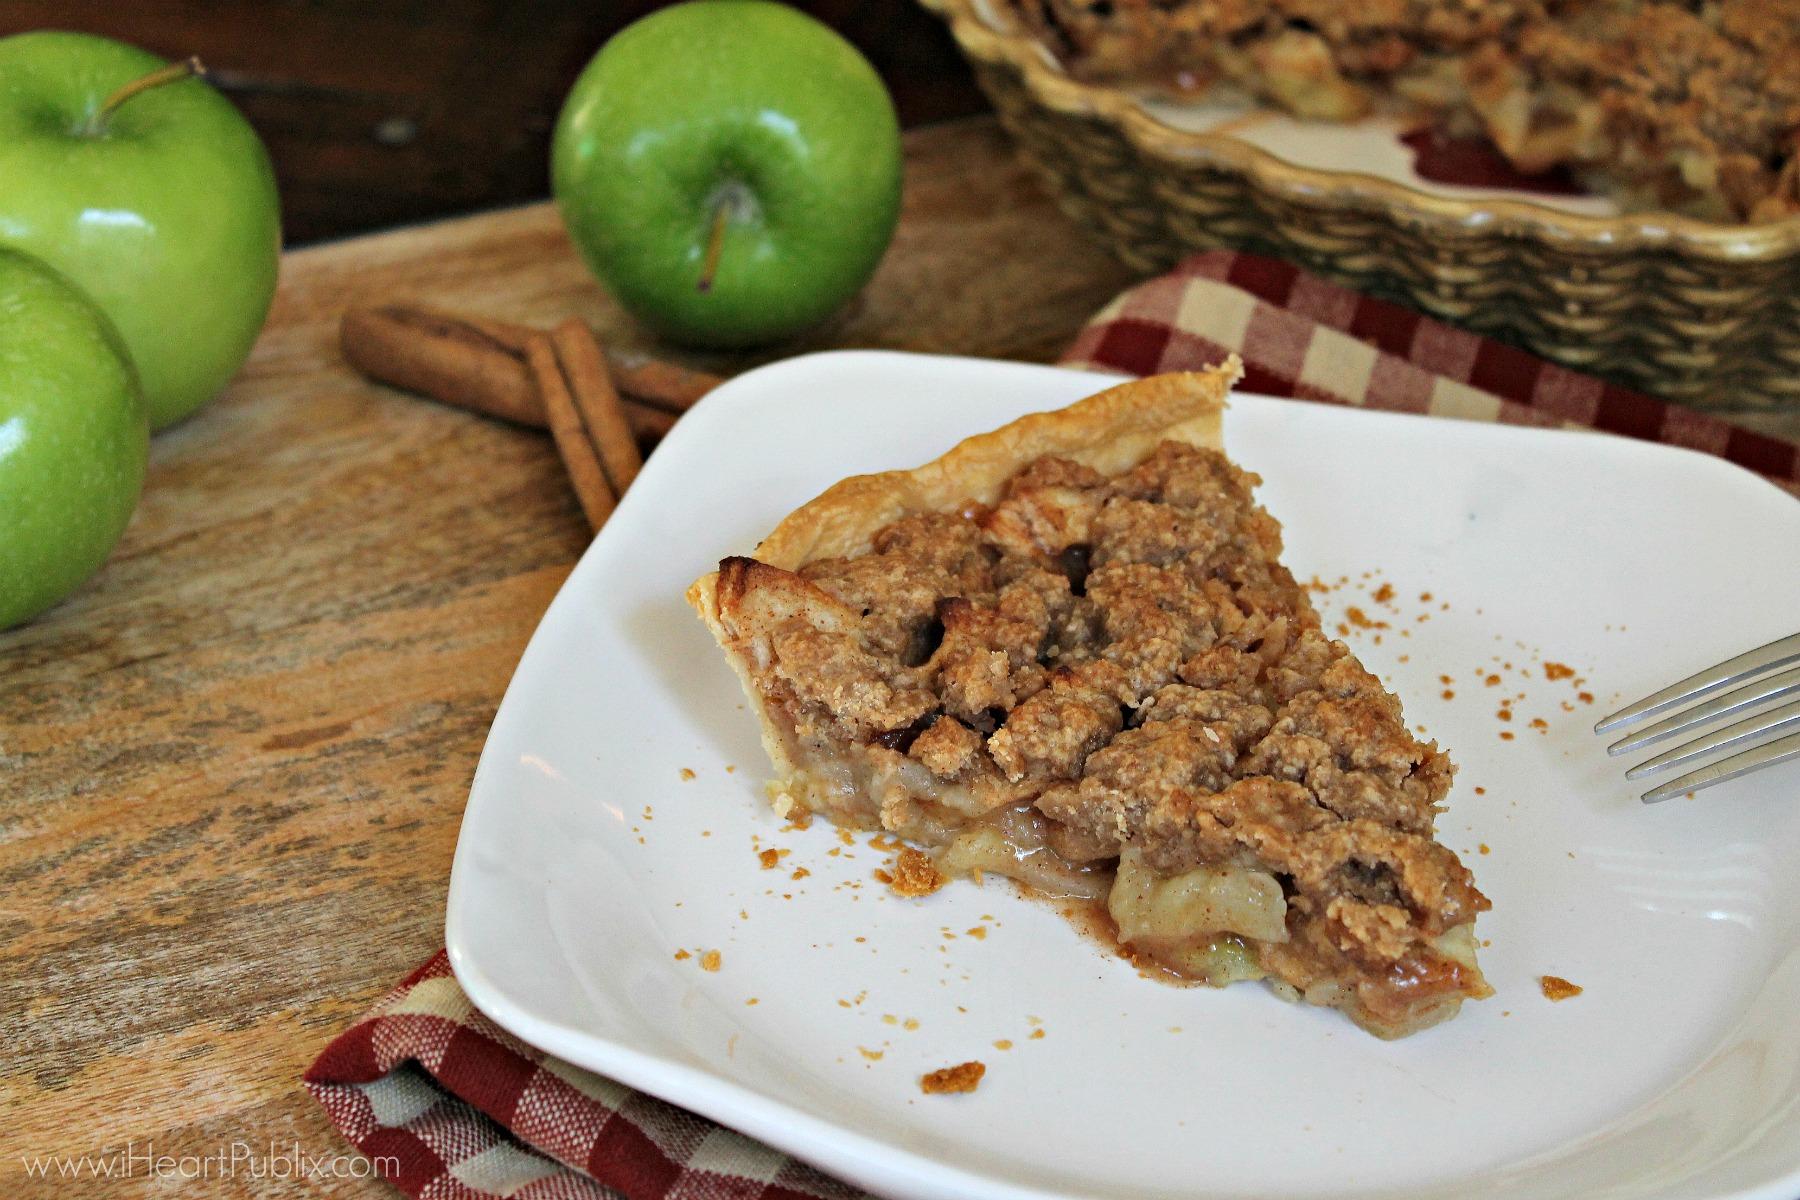 Apple Crumble Pie with Truvia® Brown Sugar Blend and Truvia® Cane Sugar Blend